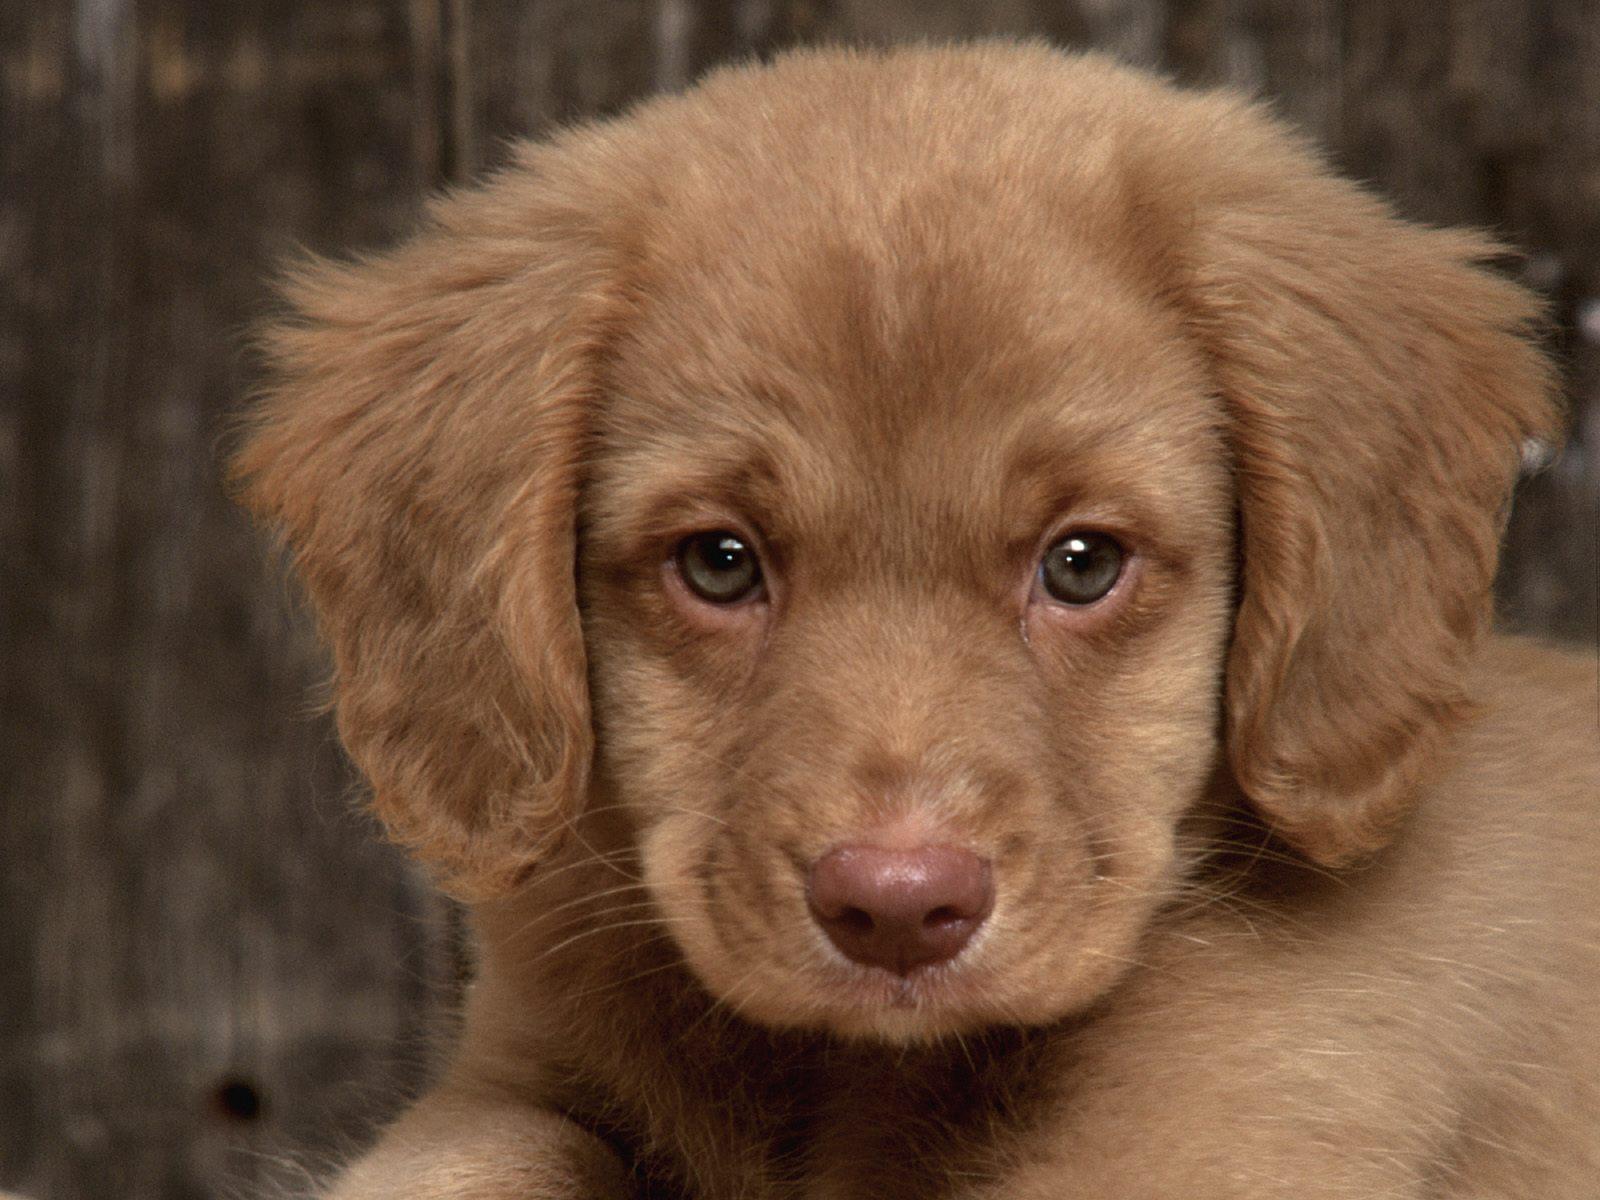 http://3.bp.blogspot.com/-BWInG9RzLk4/T_0cCwKq8fI/AAAAAAAABc0/yEXaZ_YA_Uk/s1600/Top+5+Dog+Pets+HD+Wallpapers+(4).jpg